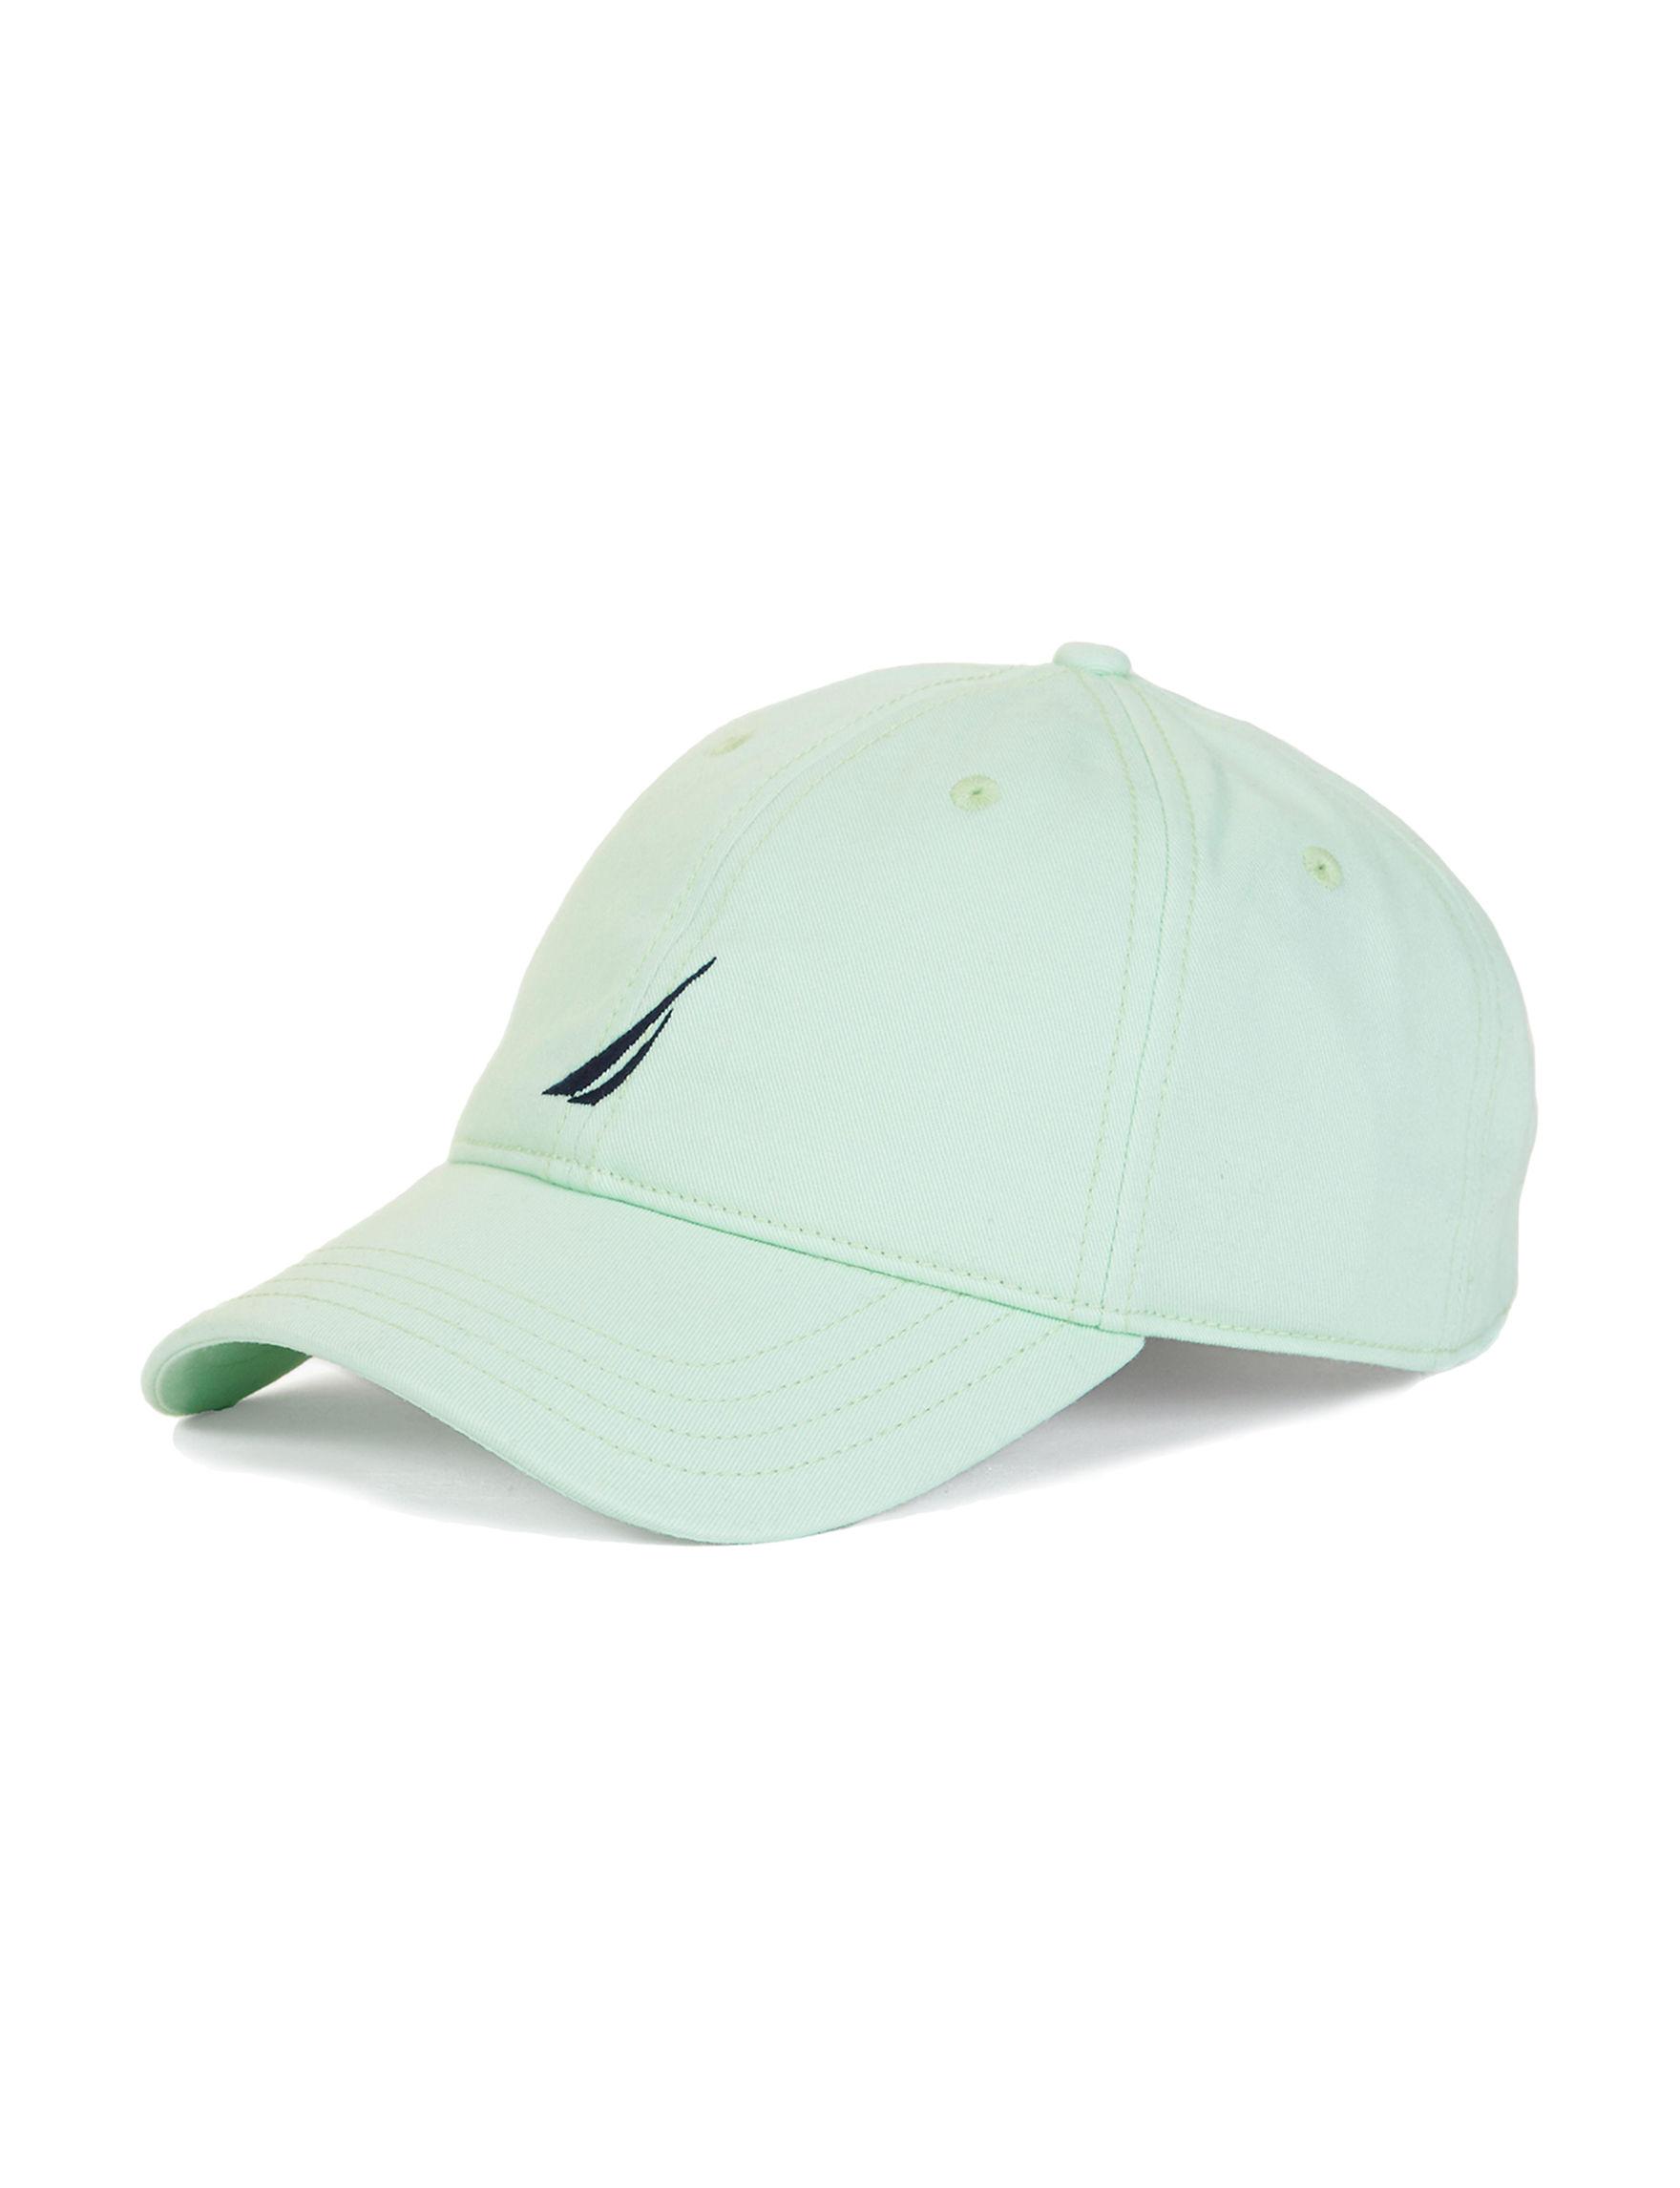 Nautica Green